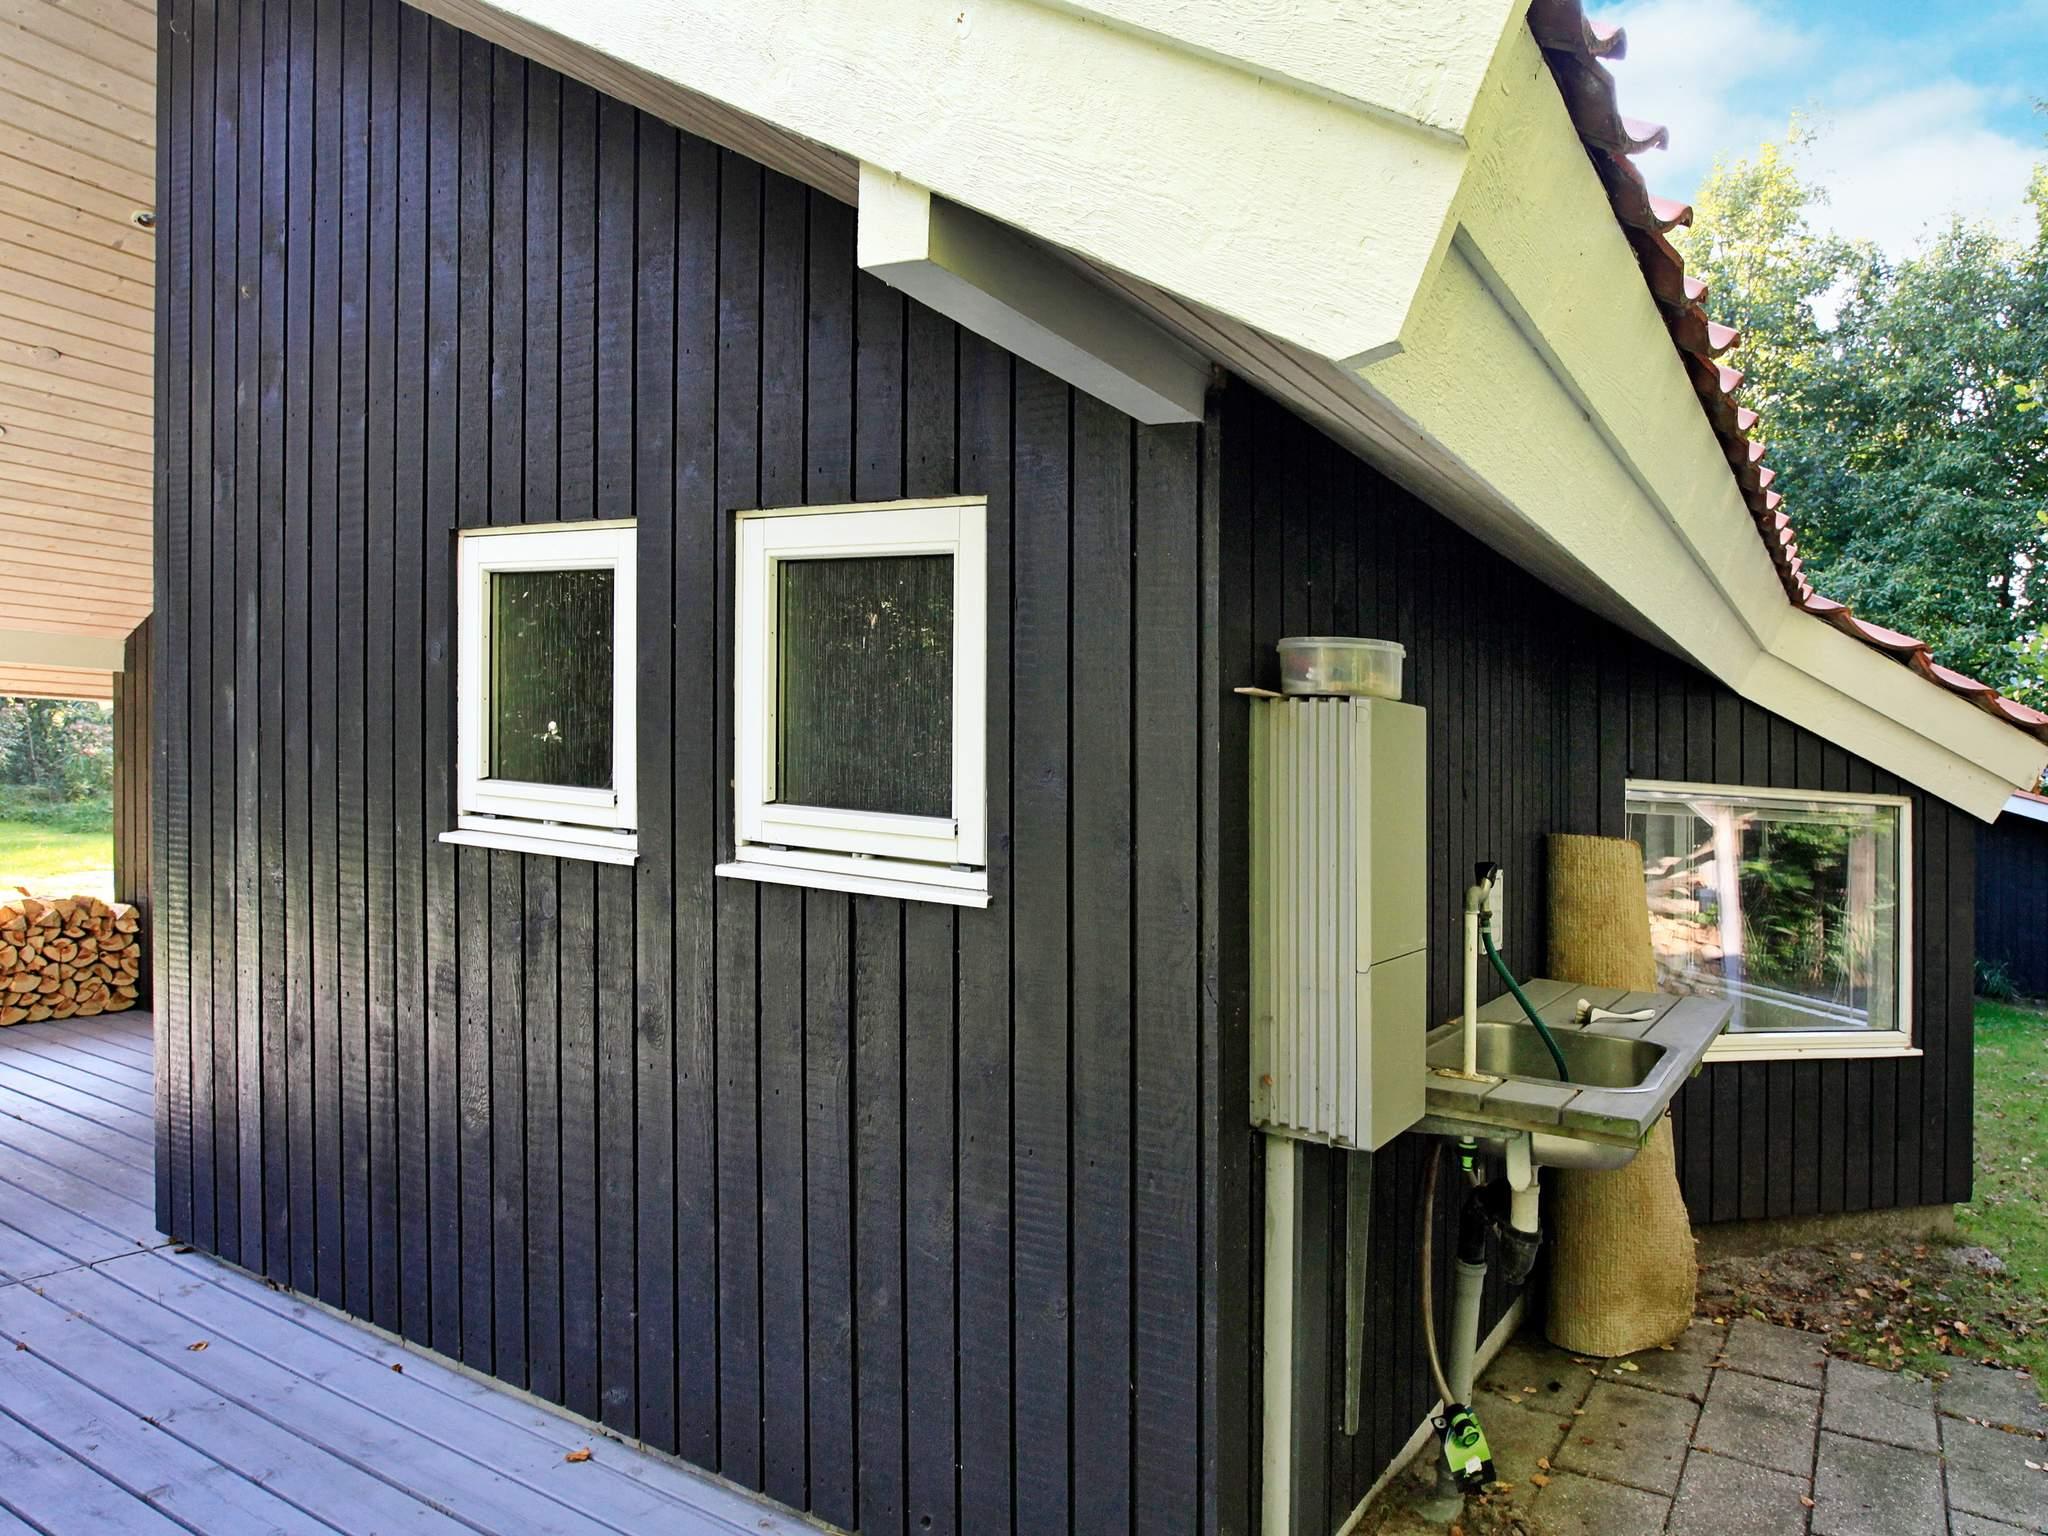 Ferienhaus Ristinge (160040), Ristinge, , Langeland, Dänemark, Bild 20